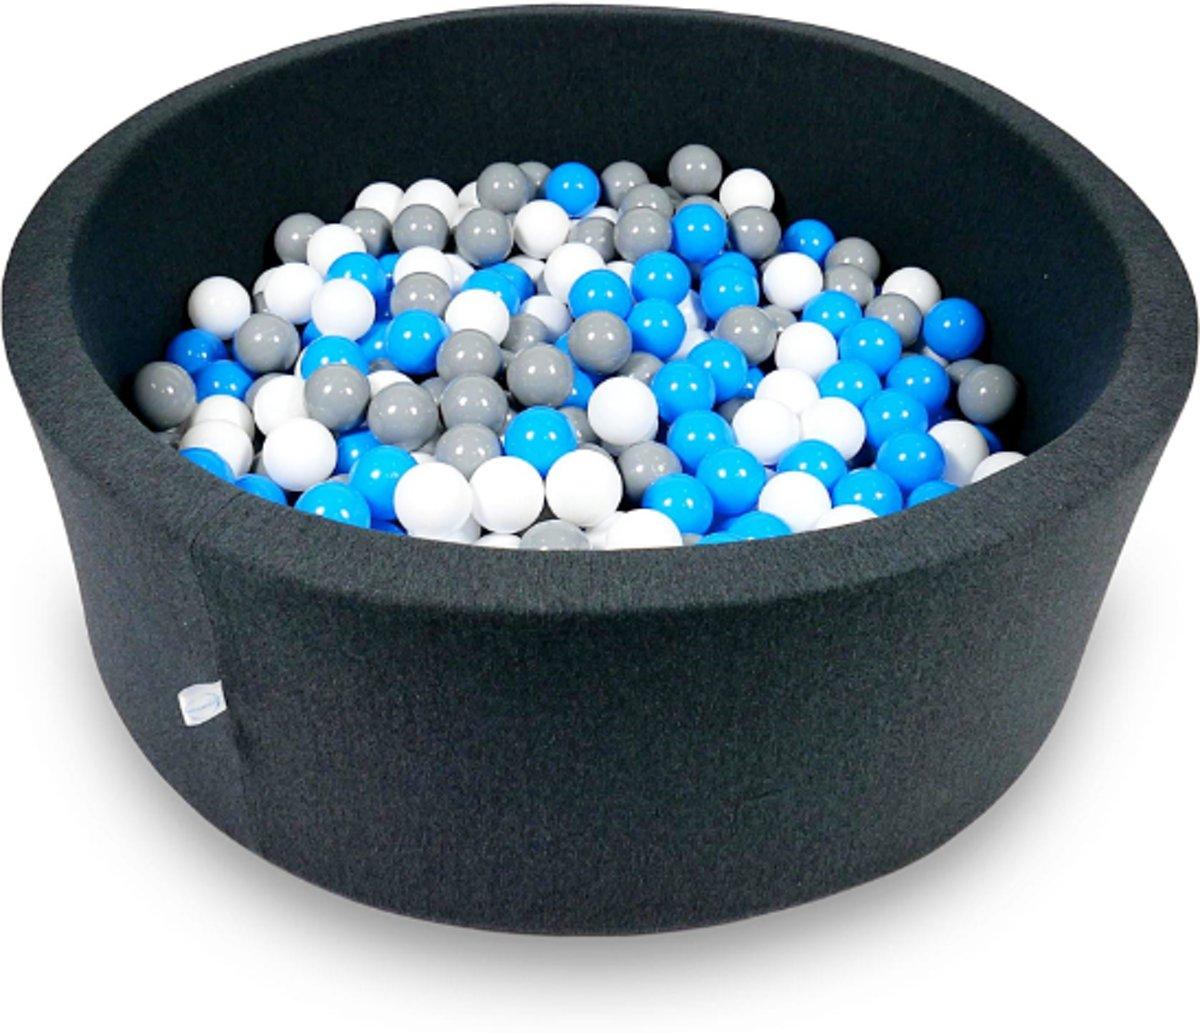 Ballenbak - 500 ballen - 115 x 40 cm - ballenbad - rond donker grijs